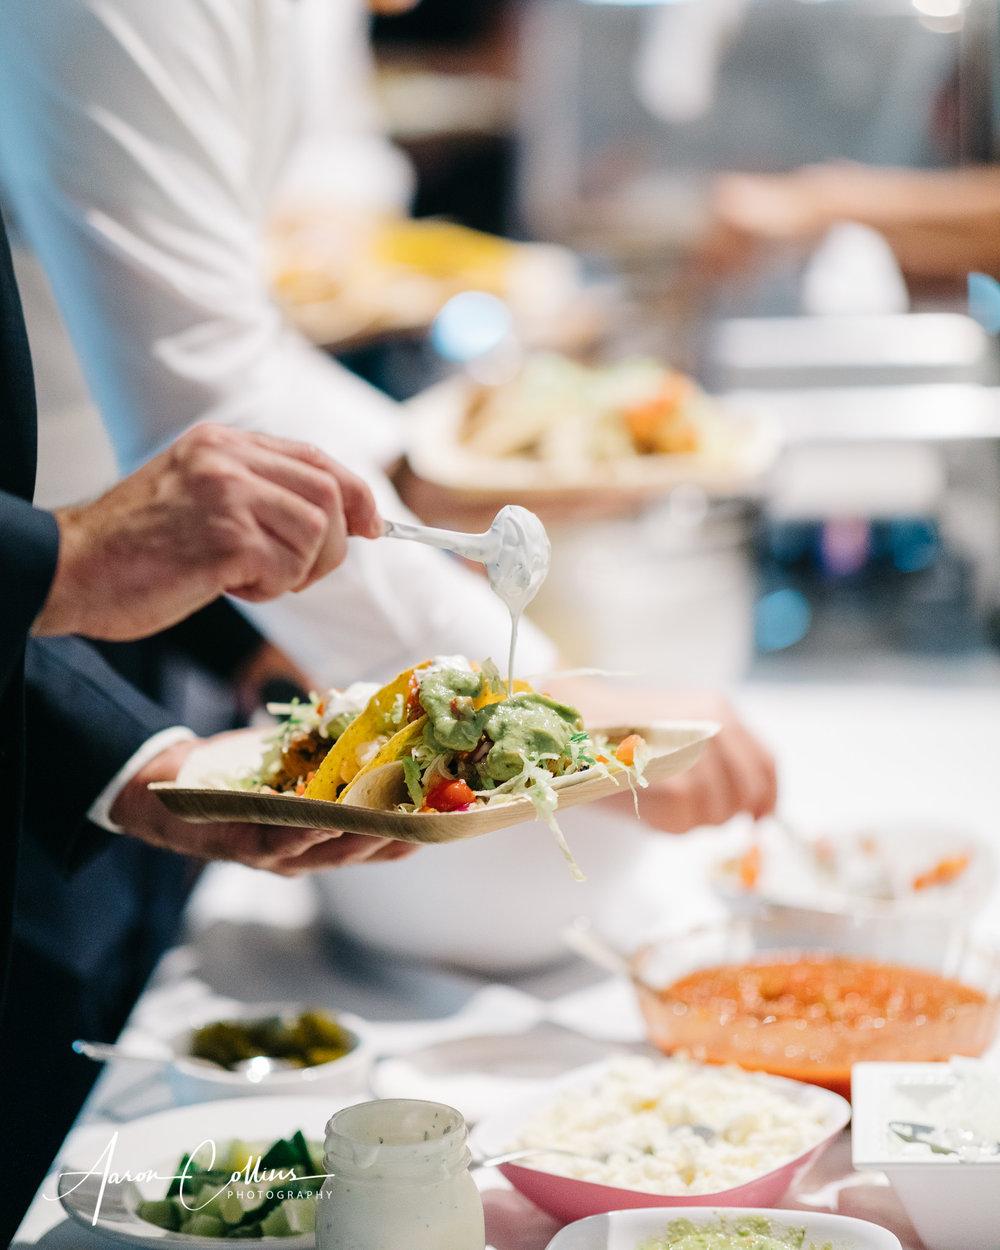 Taco bar from Kimberly's Block Island during the reception at BIMI